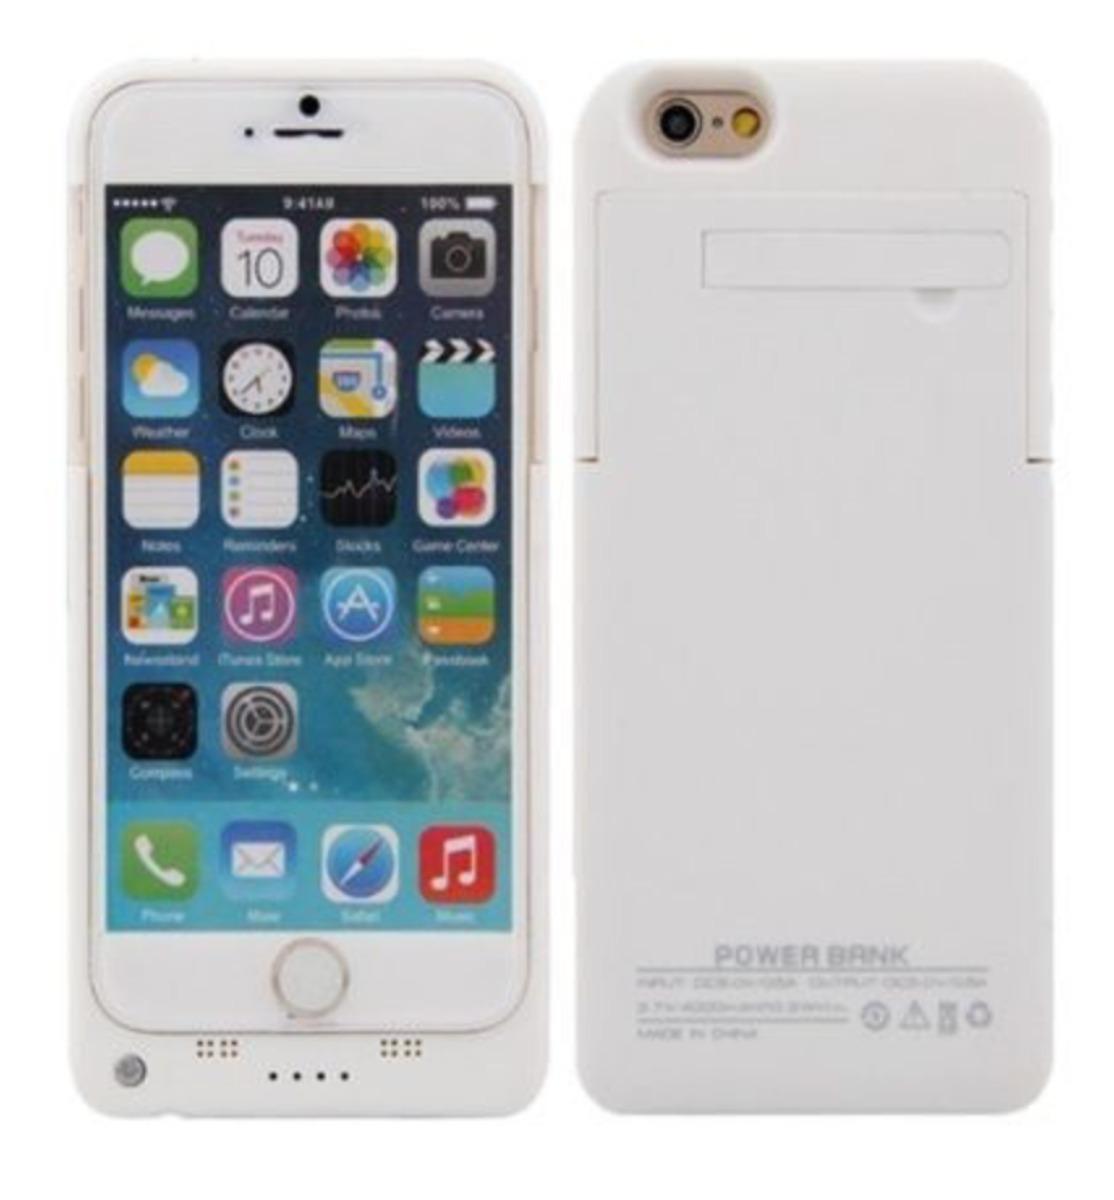 b156d9f1c13 Funda Cargador Bateria iPhone 5/5s/se 2200mah - $ 700,00 en Mercado ...